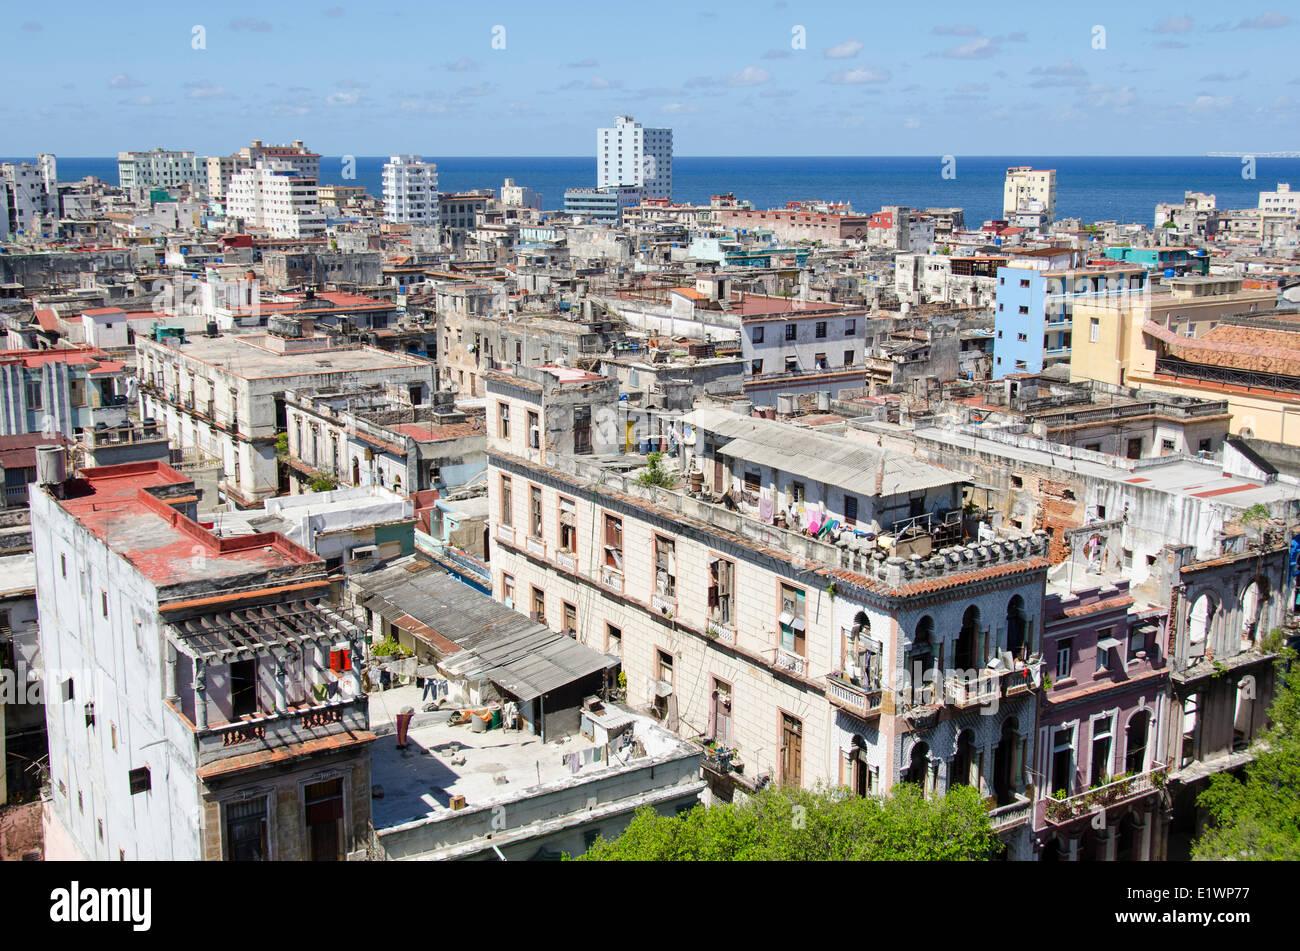 Rooftops towards the Malecon, Havana, Cuba - Stock Image